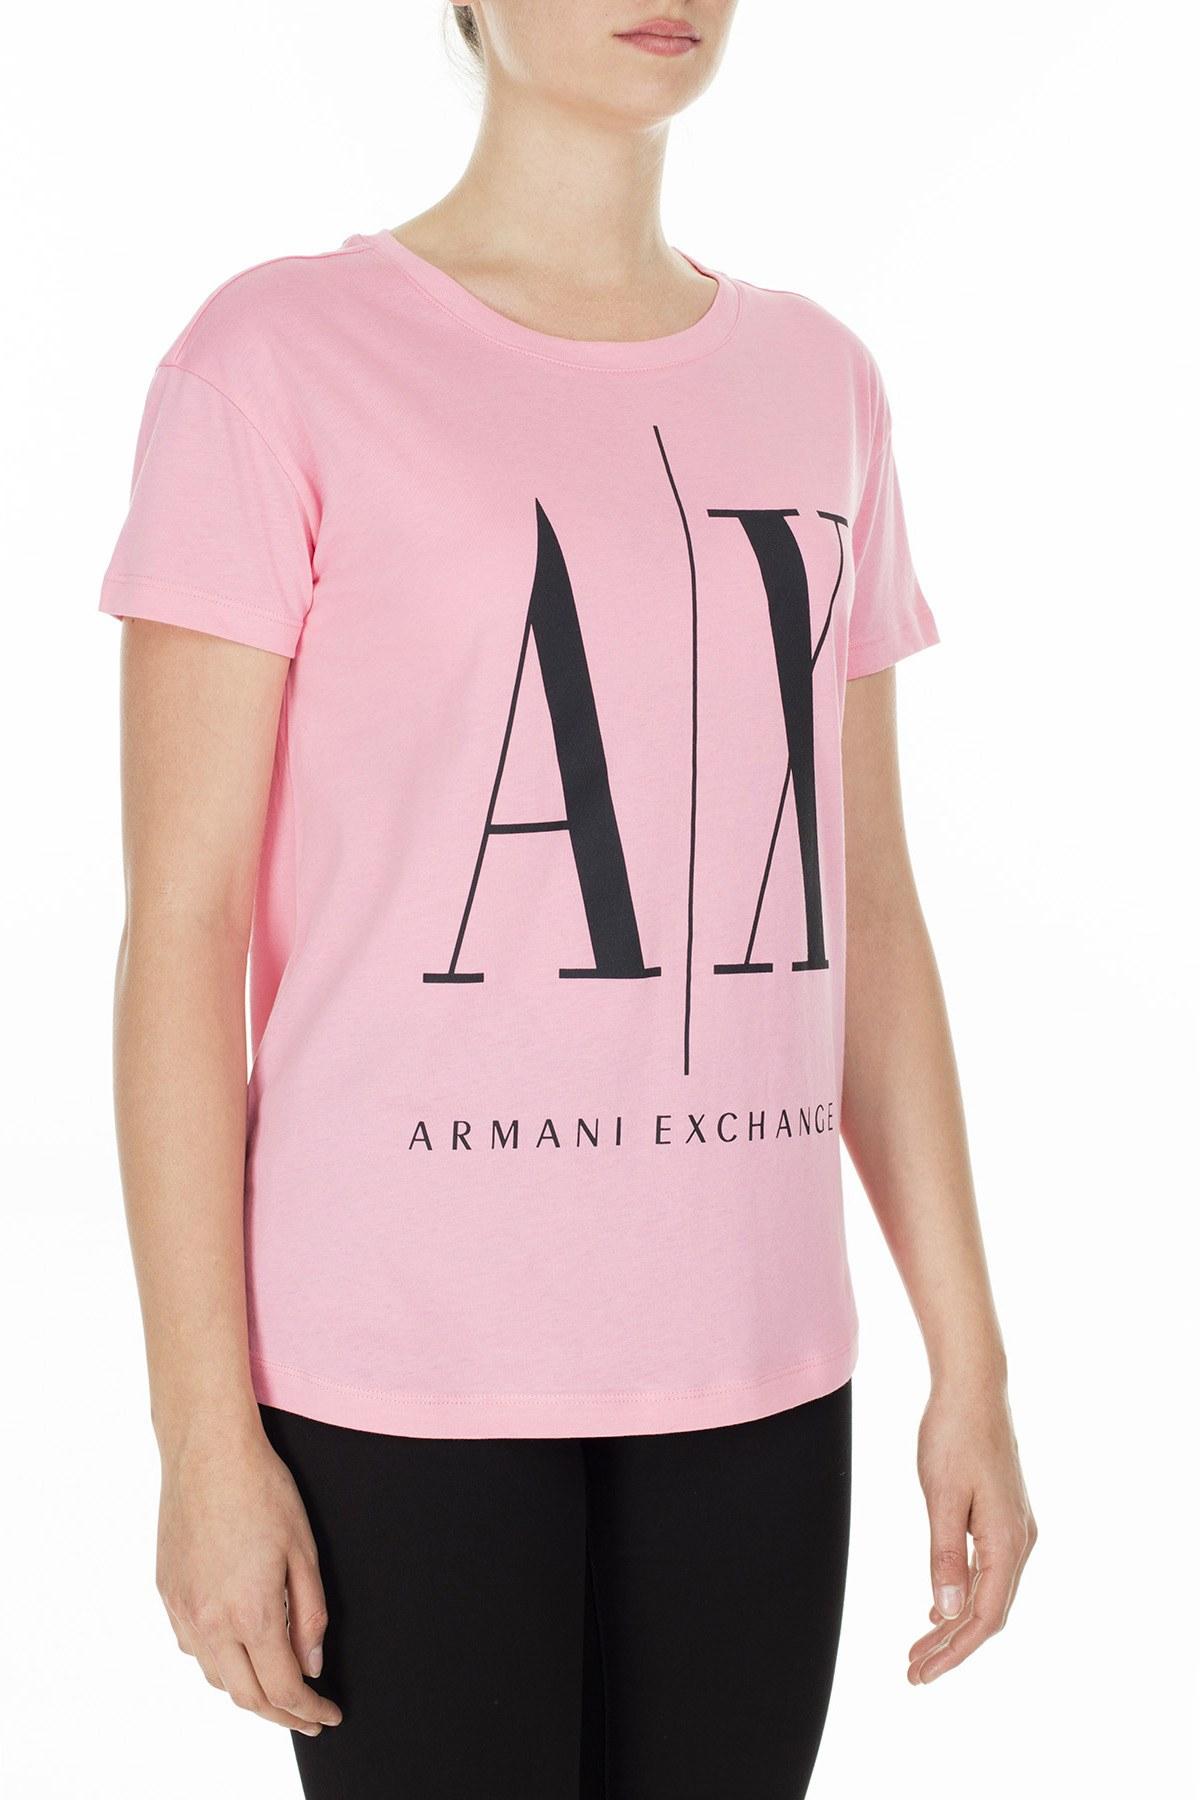 Armani Exchange Kadın T Shirt 8NYTCX YJG3Z 1475 PEMBE